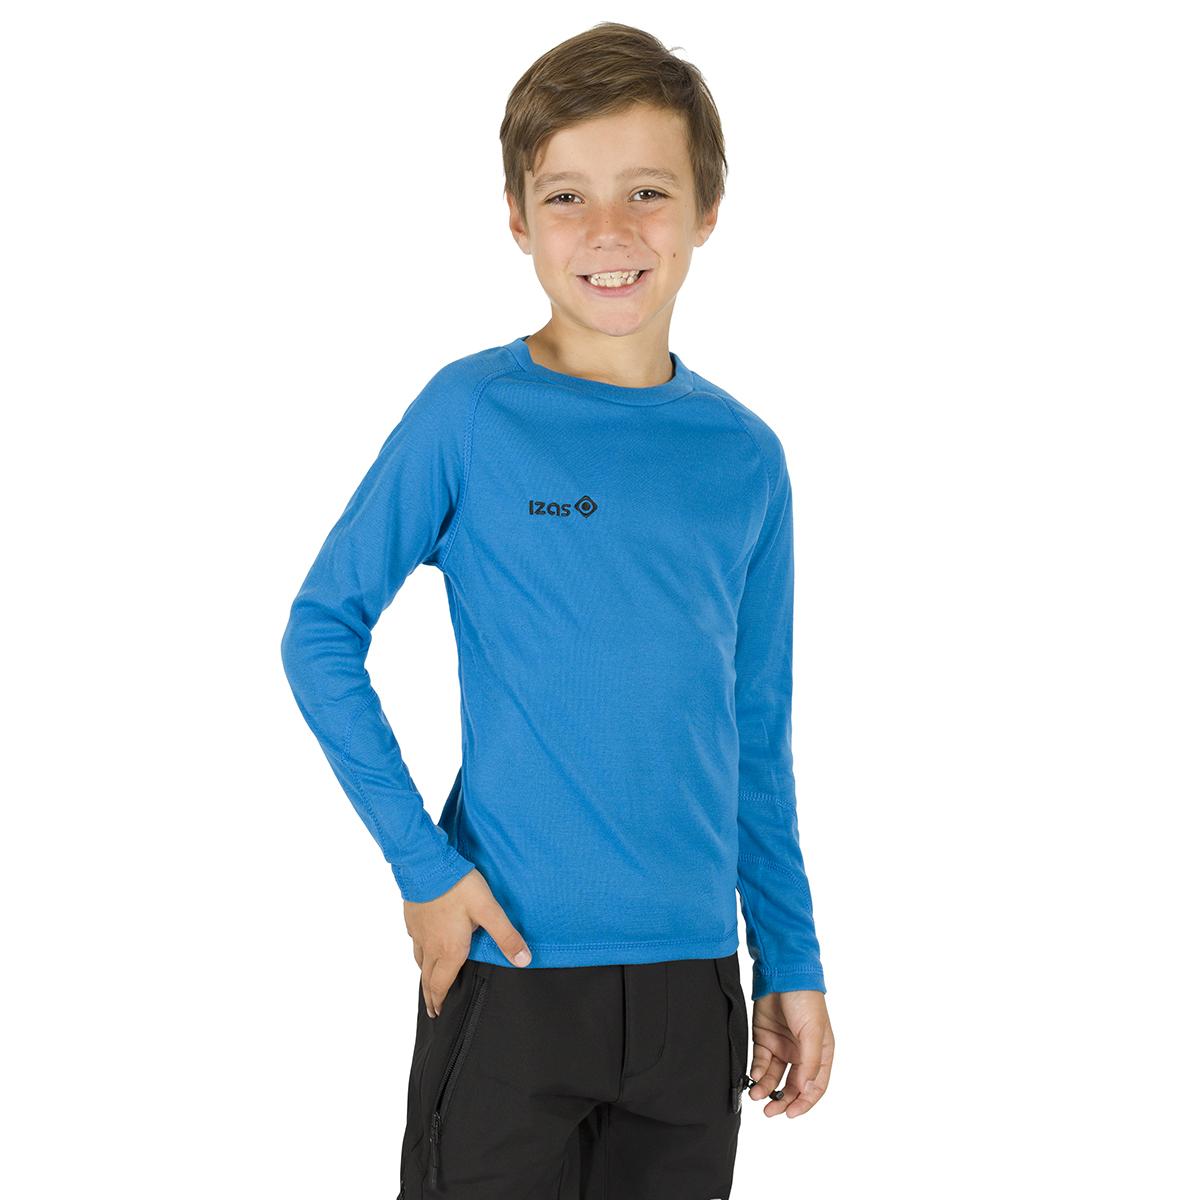 NELION KIDS THERMAL T-SHIRT BLUE